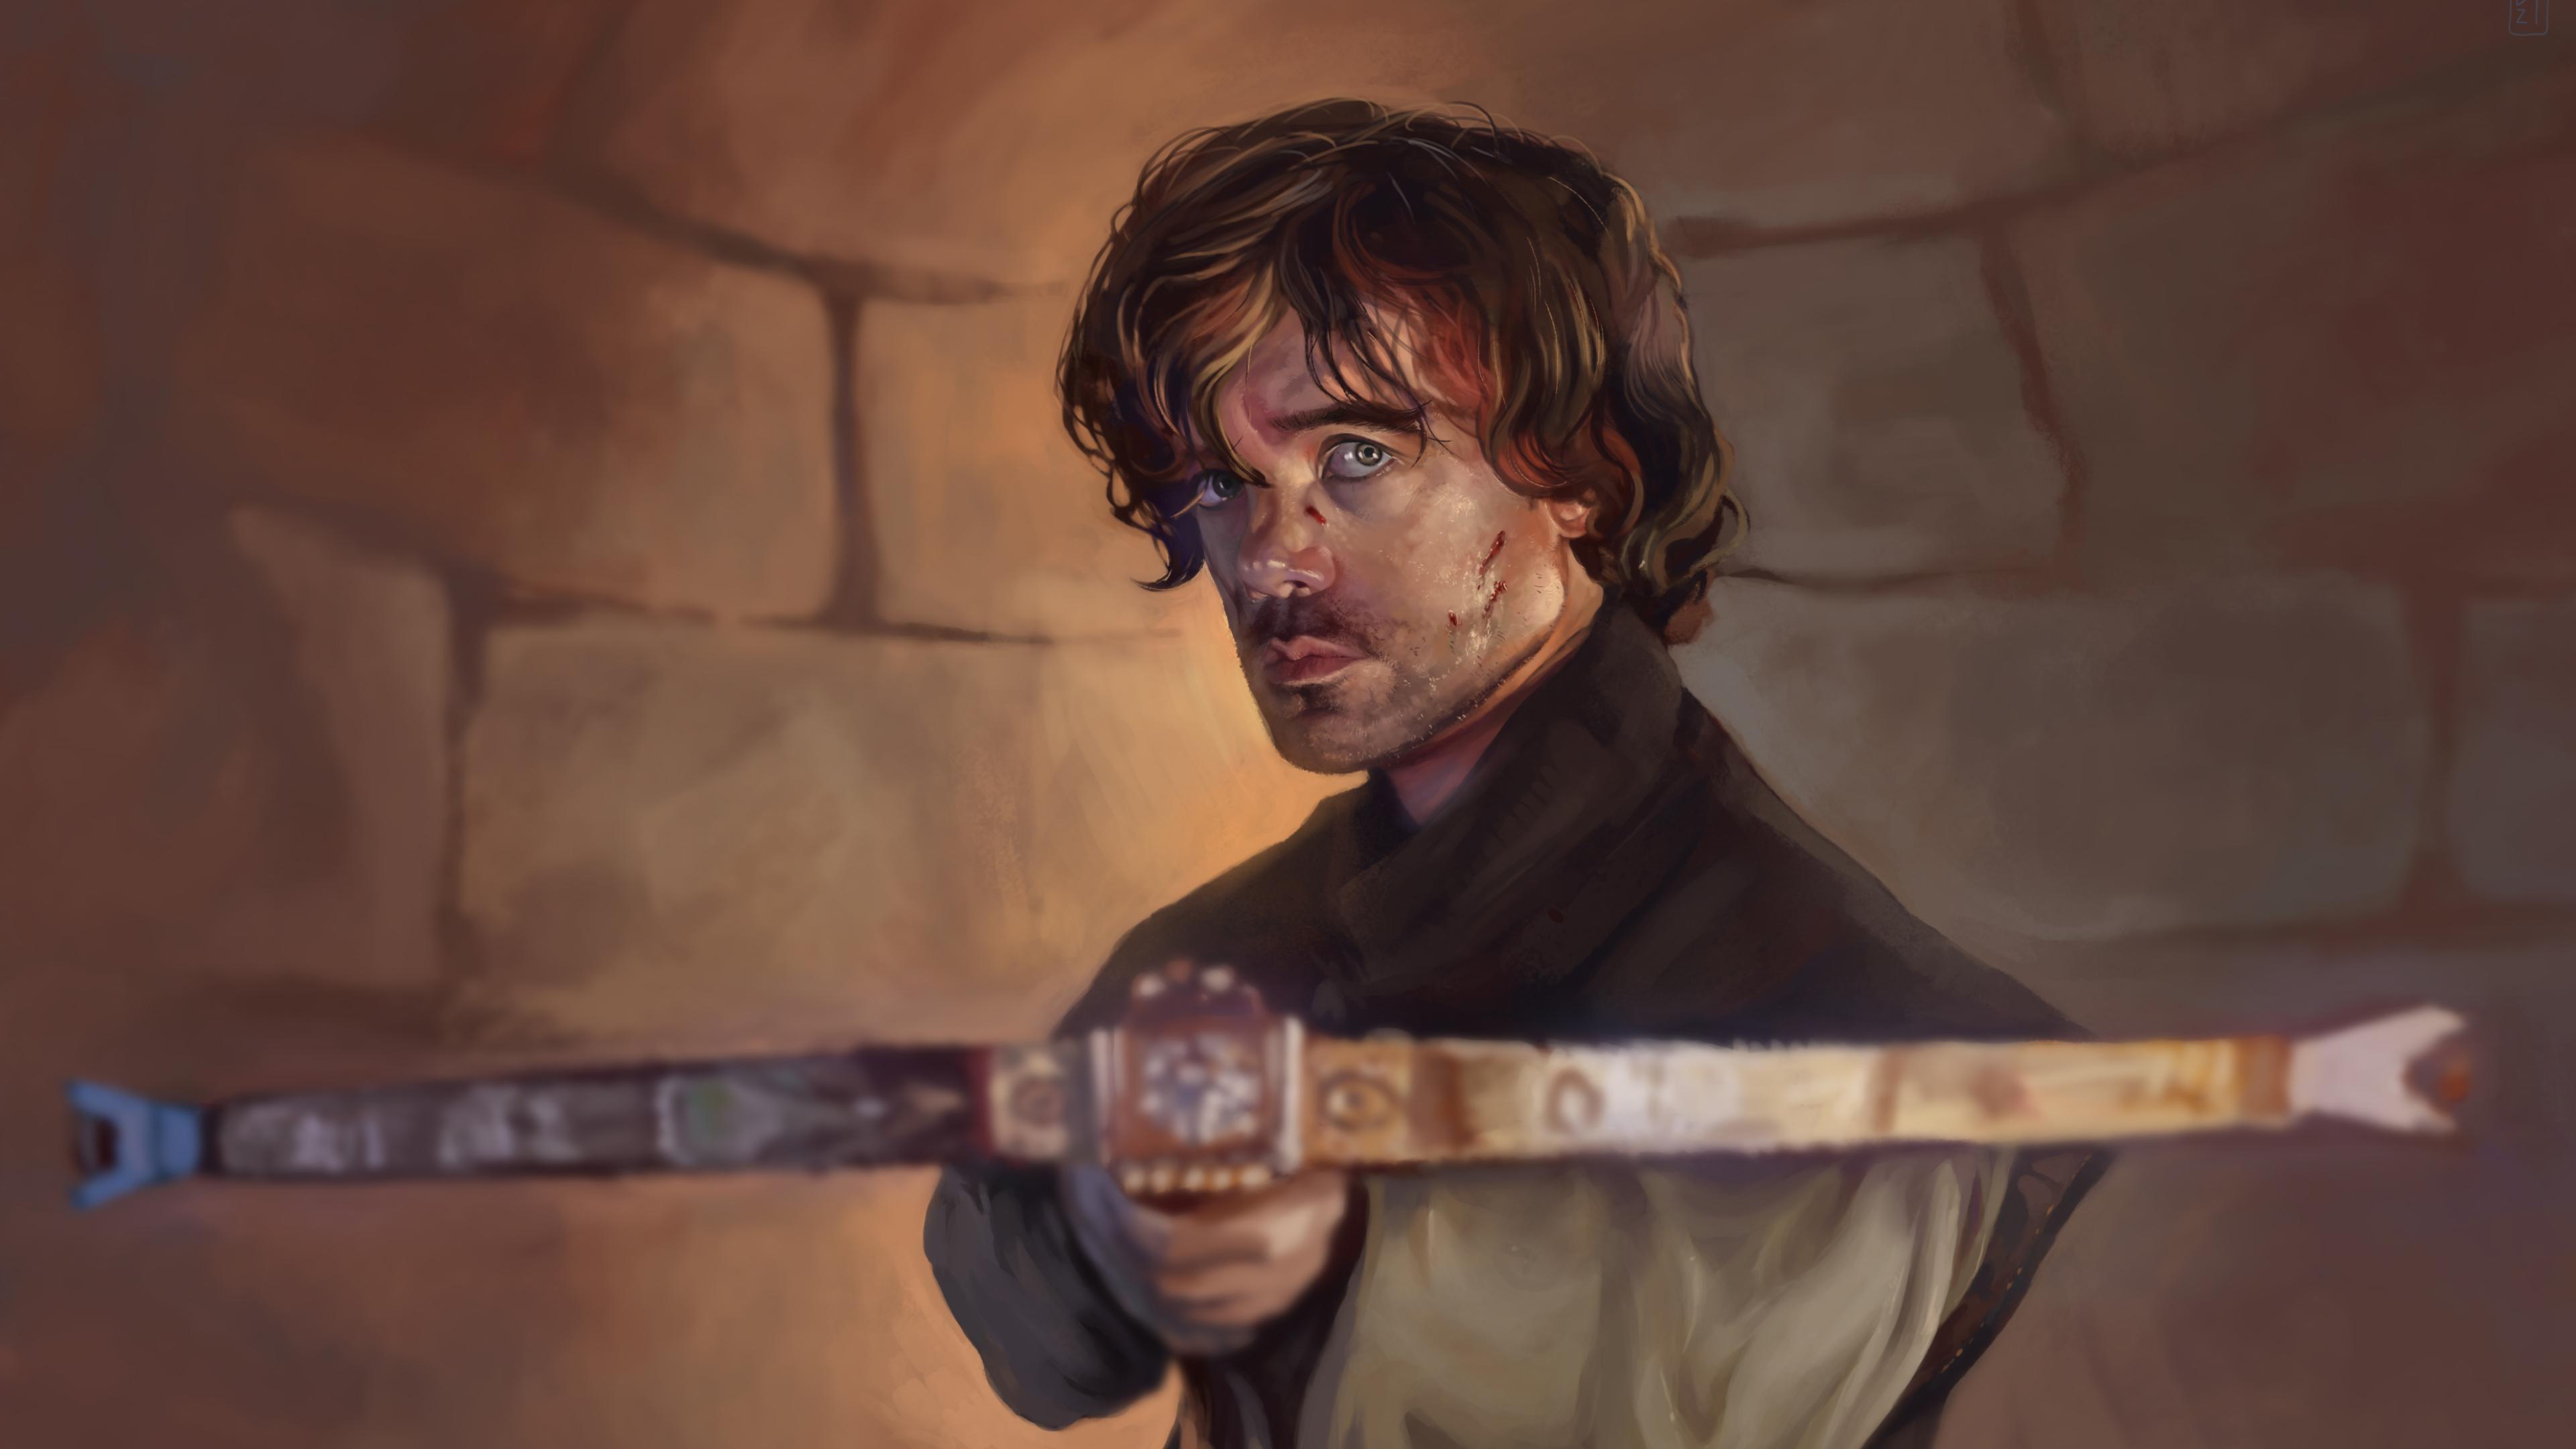 4k Game Of Thrones Tyrion Lannister Best Wallpaper - Game Of Thrones Tyrion Lannister Wallpaper 4k - HD Wallpaper